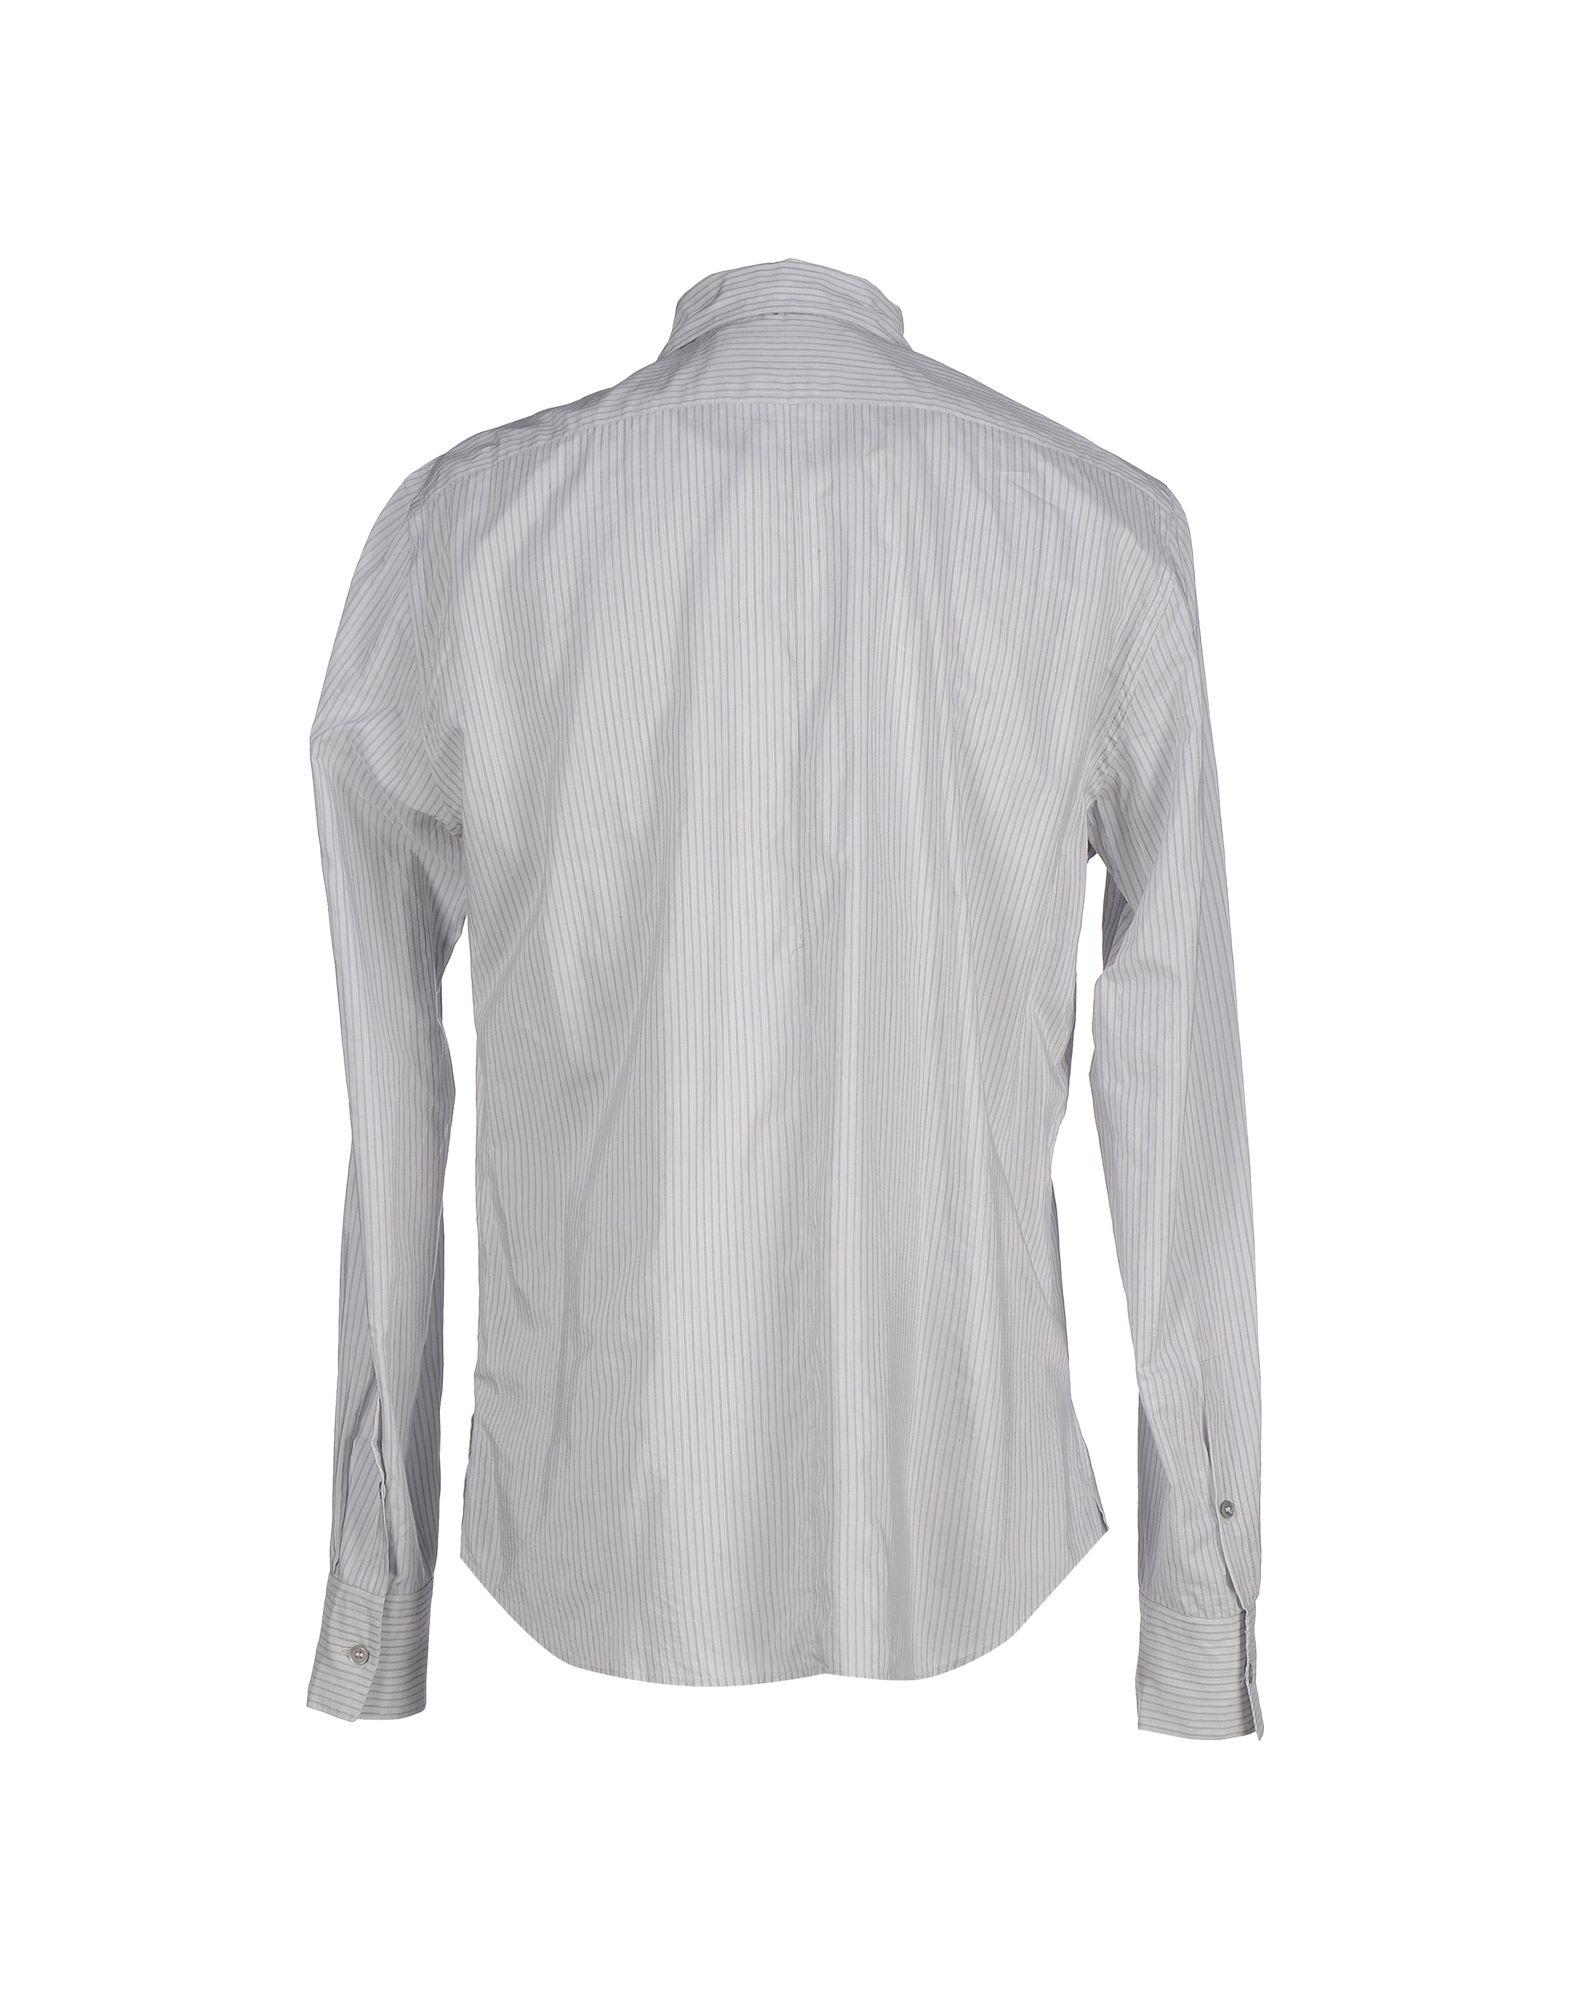 Lyst Marni Shirt In Gray For Men